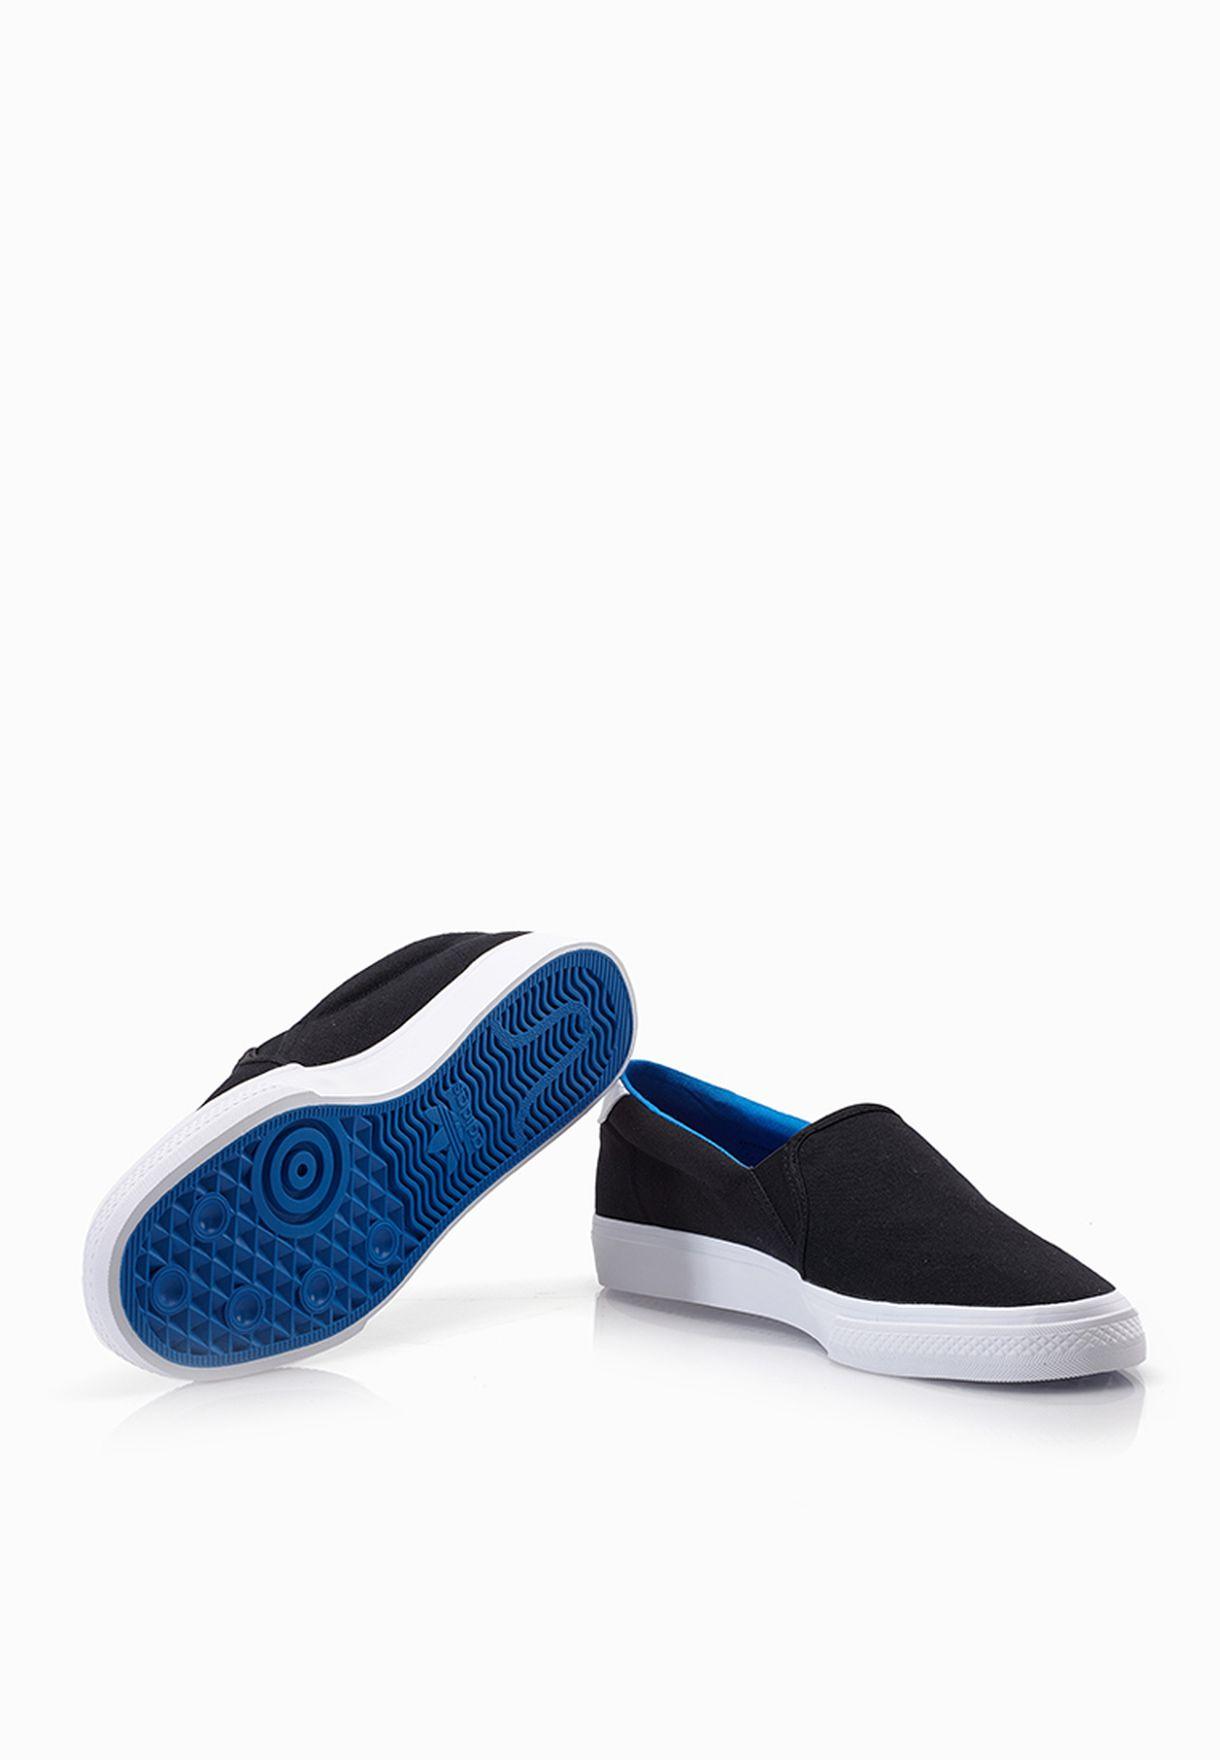 separation shoes d1550 9f6bf adidas Originals. Adidrill Vulc